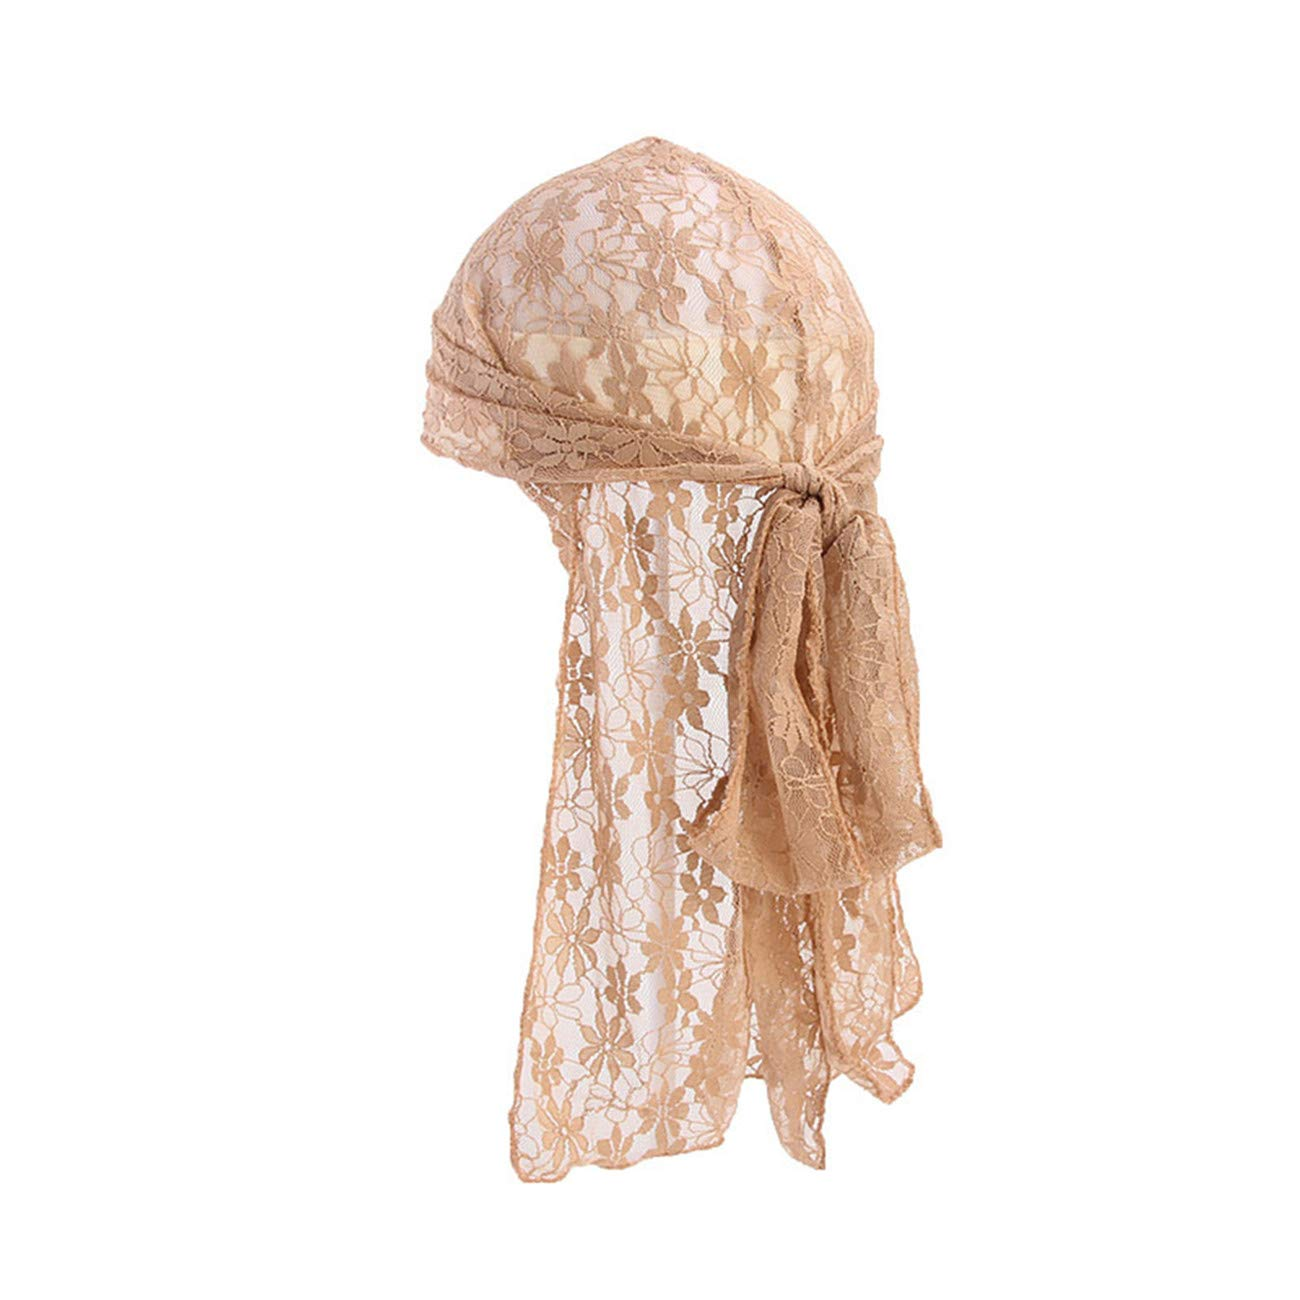 Khaki Bigsweety Frauen Chemo Hat Elastic Ladies Sch/öne Spitze Long Tail Head Wrap Caps F/ür Krebspatienten